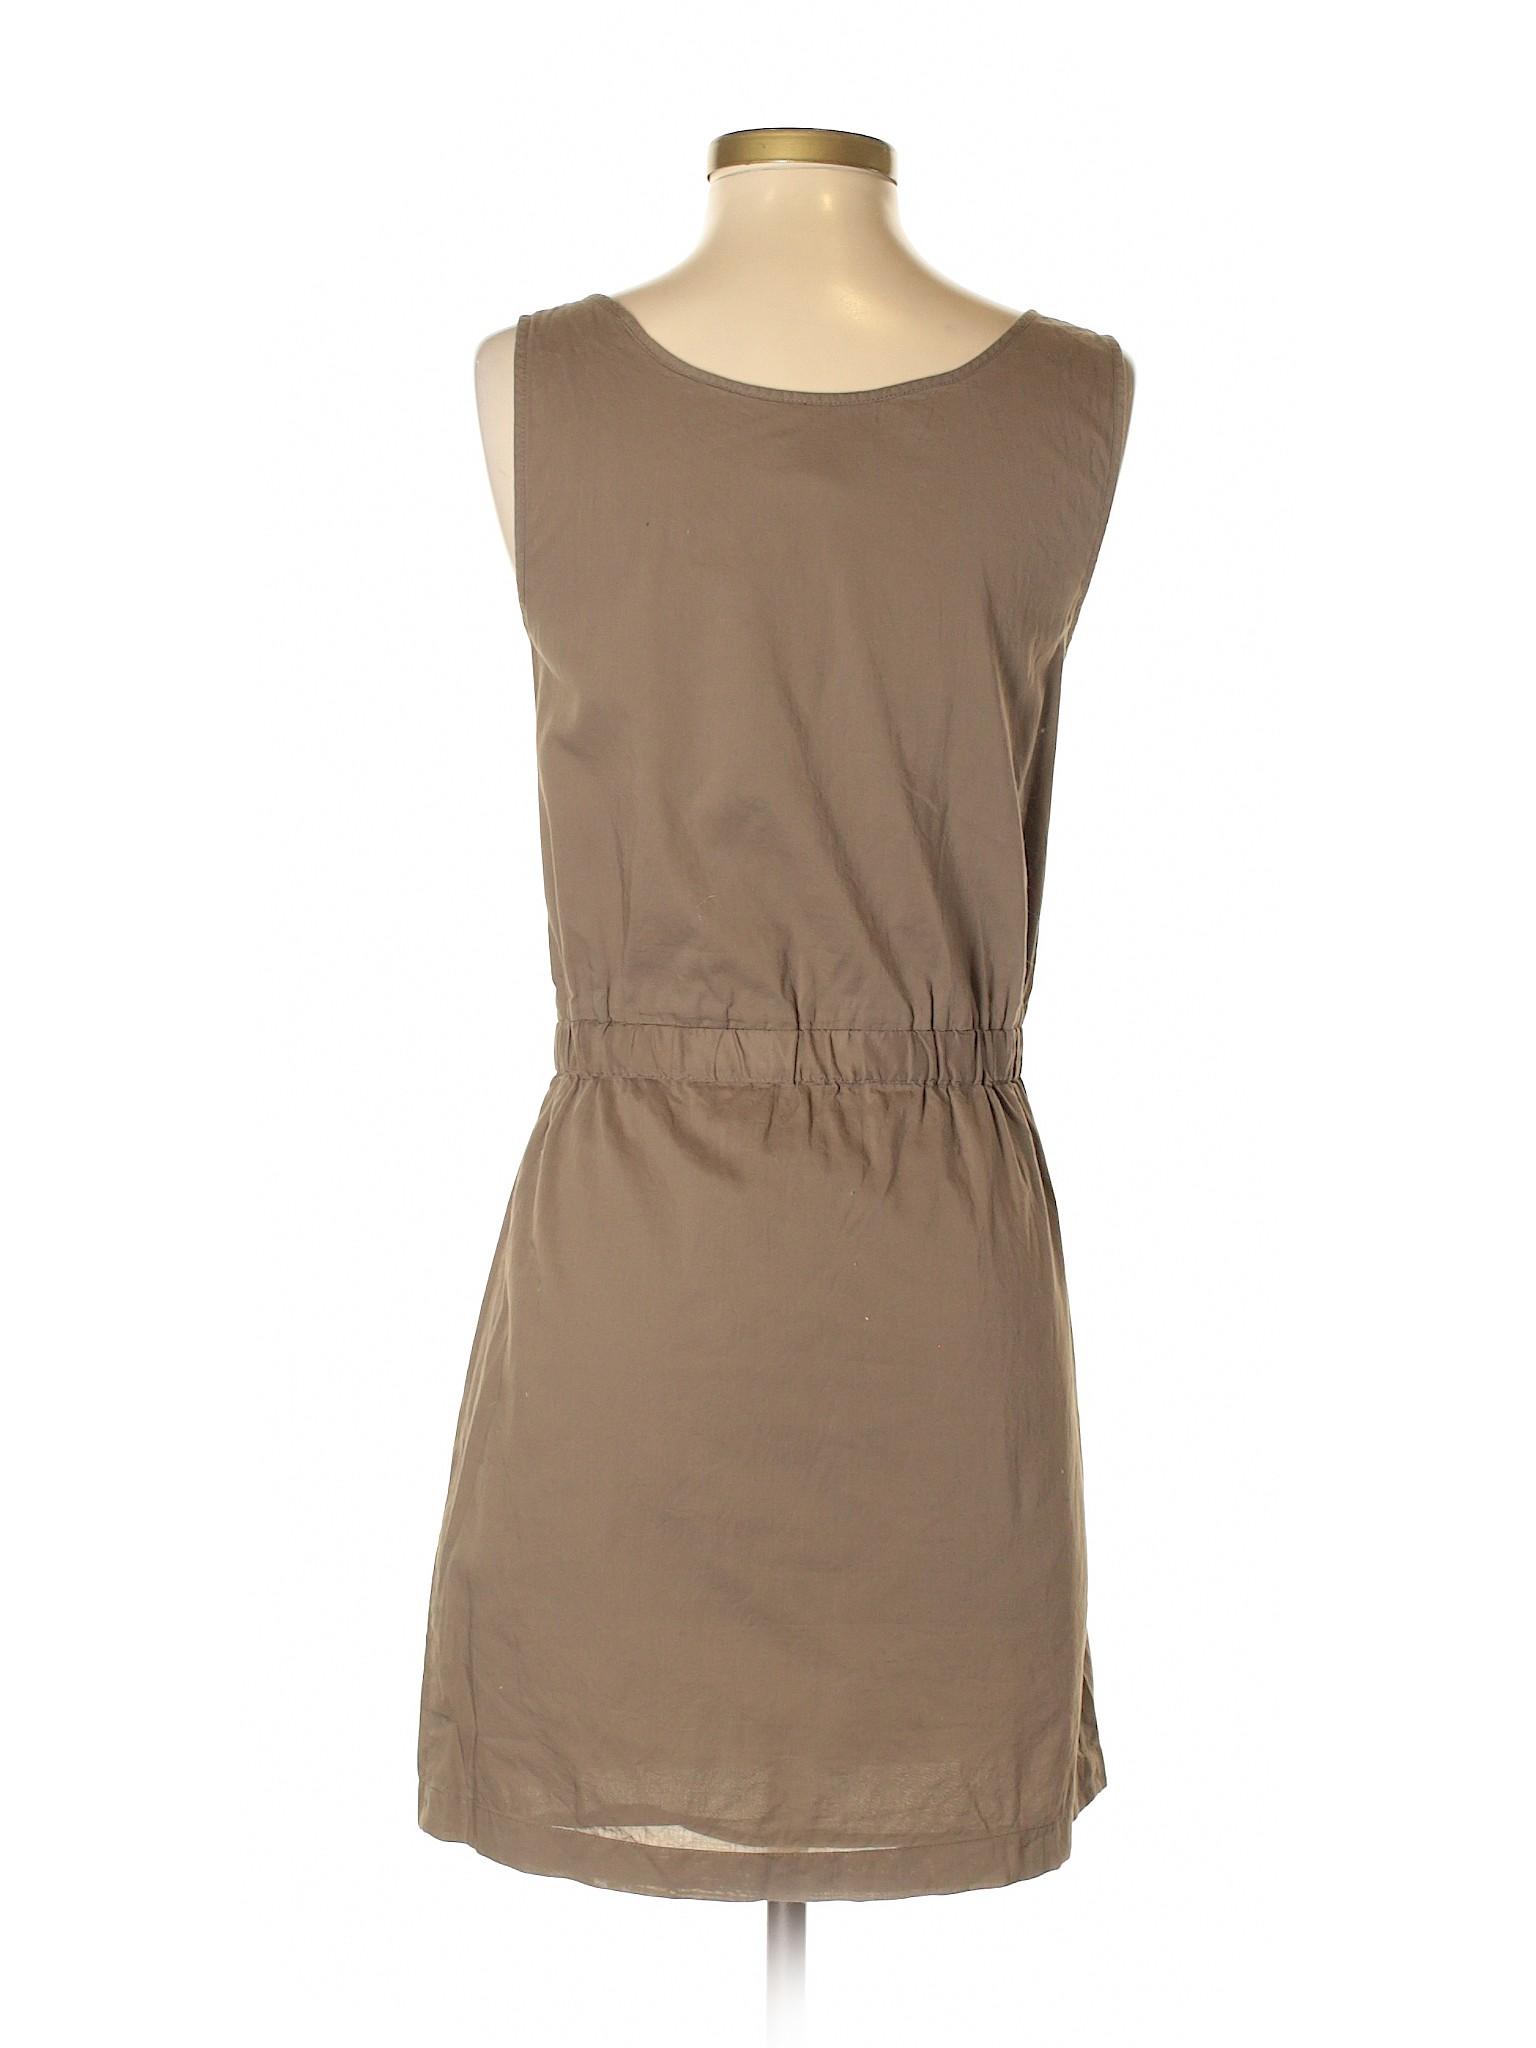 winter LOFT Ann Taylor Boutique Dress Casual d7wfW